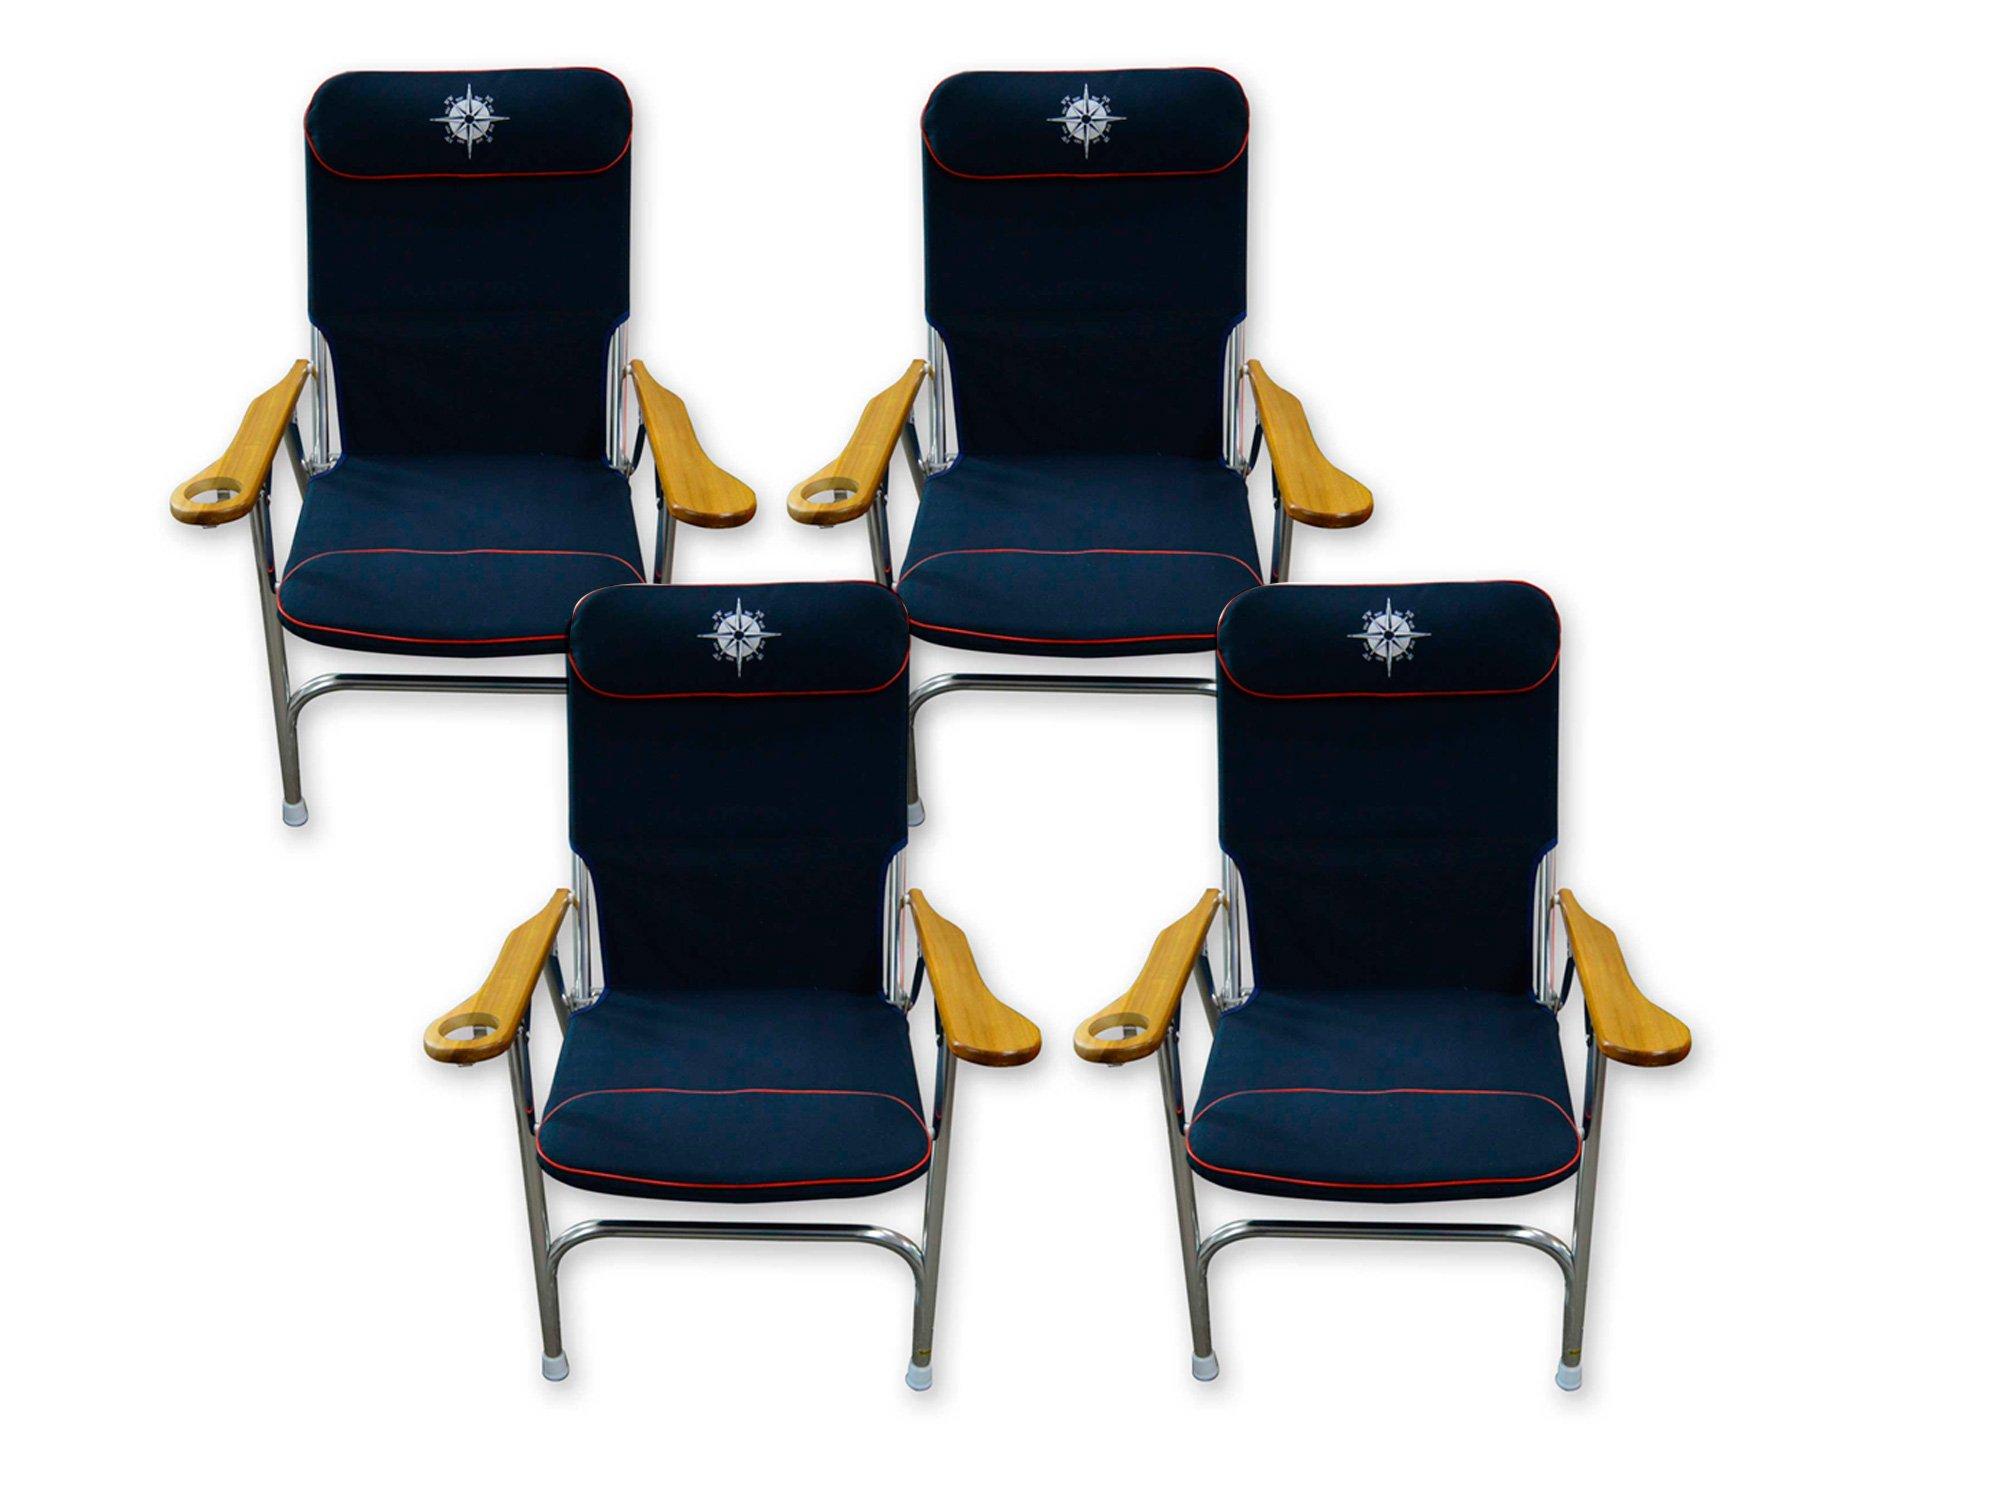 Five Oceans Navy Blue Skipper Deck Chair (Set of 4) - BC 3885